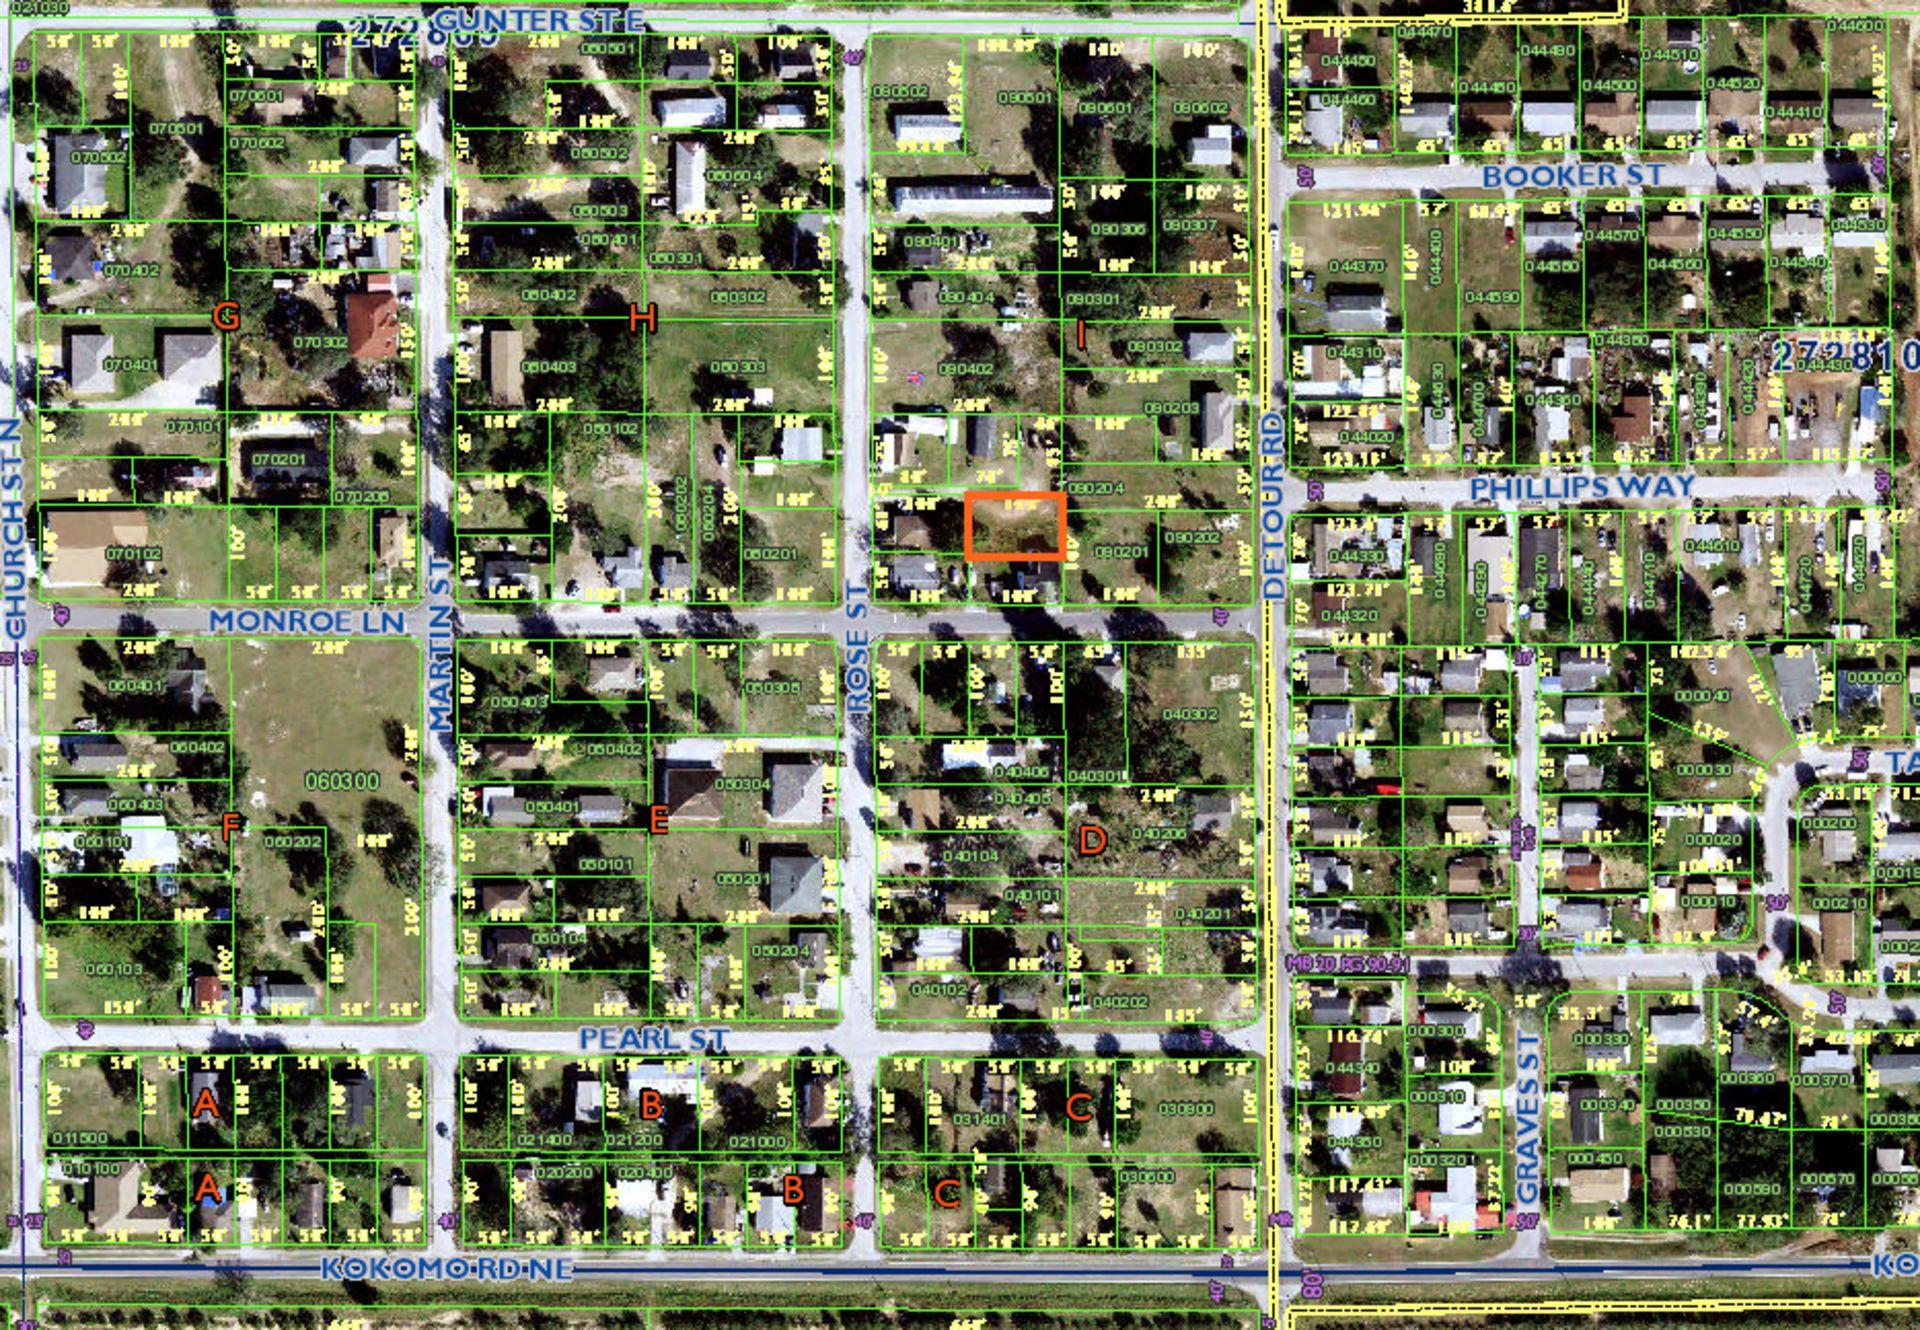 Polk County, FL Paradise! - Image 4 of 6